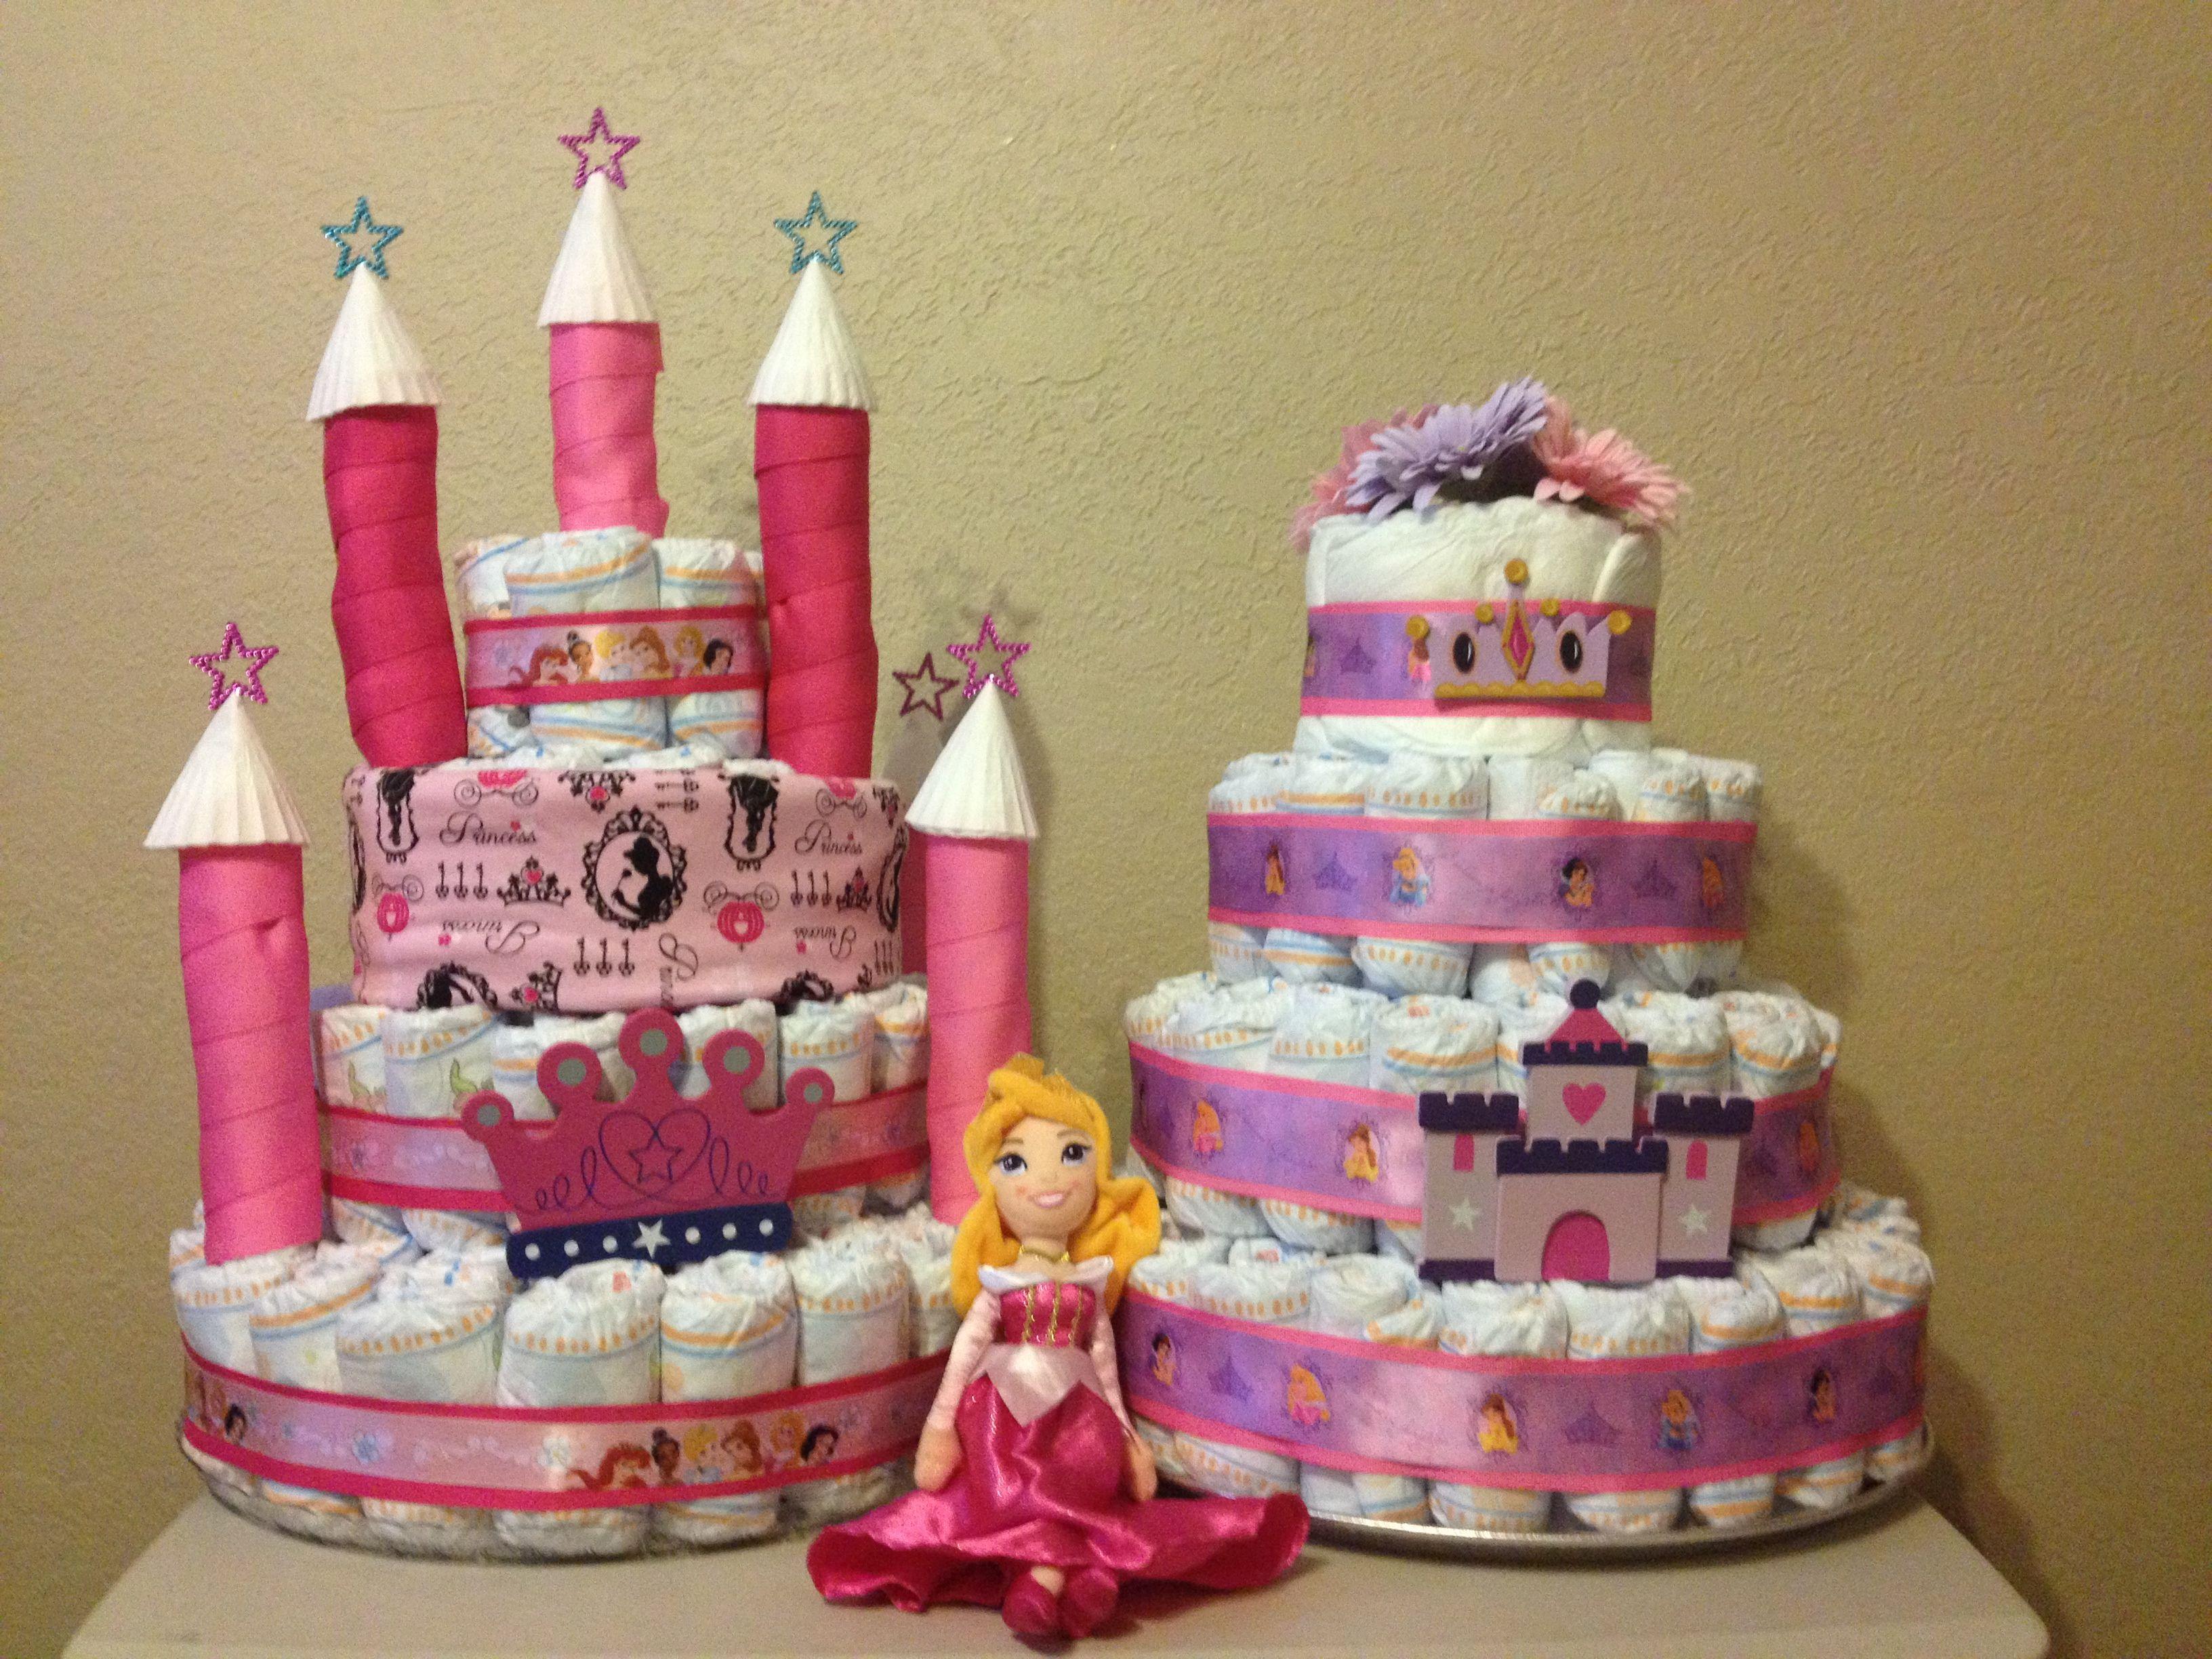 Disney Princess Themed Baby Shower Ideas